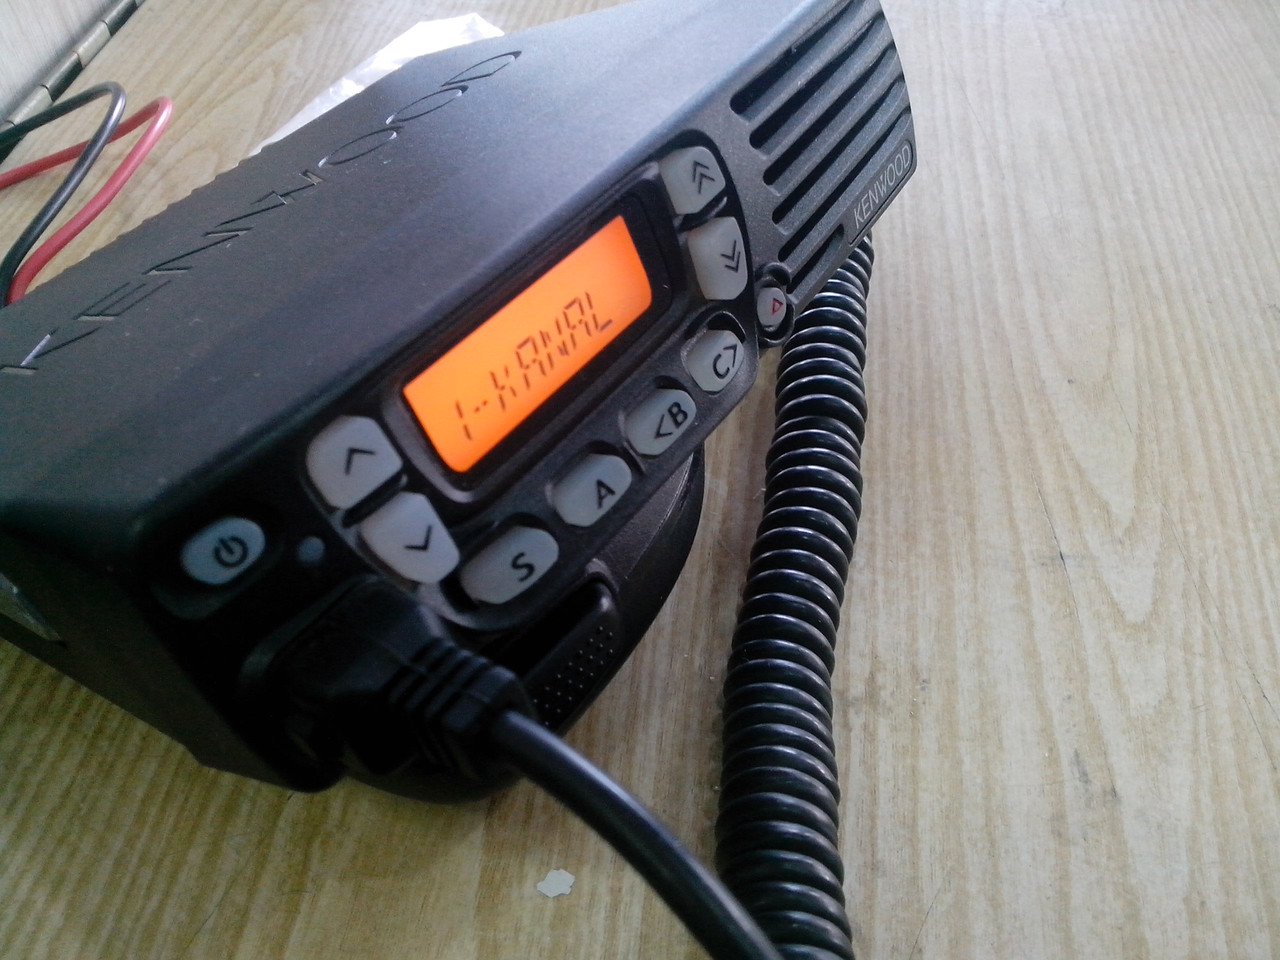 Kenwood TK-7060 (7Р22В, TK-7160), VHF рация, радиостанция со скреблером